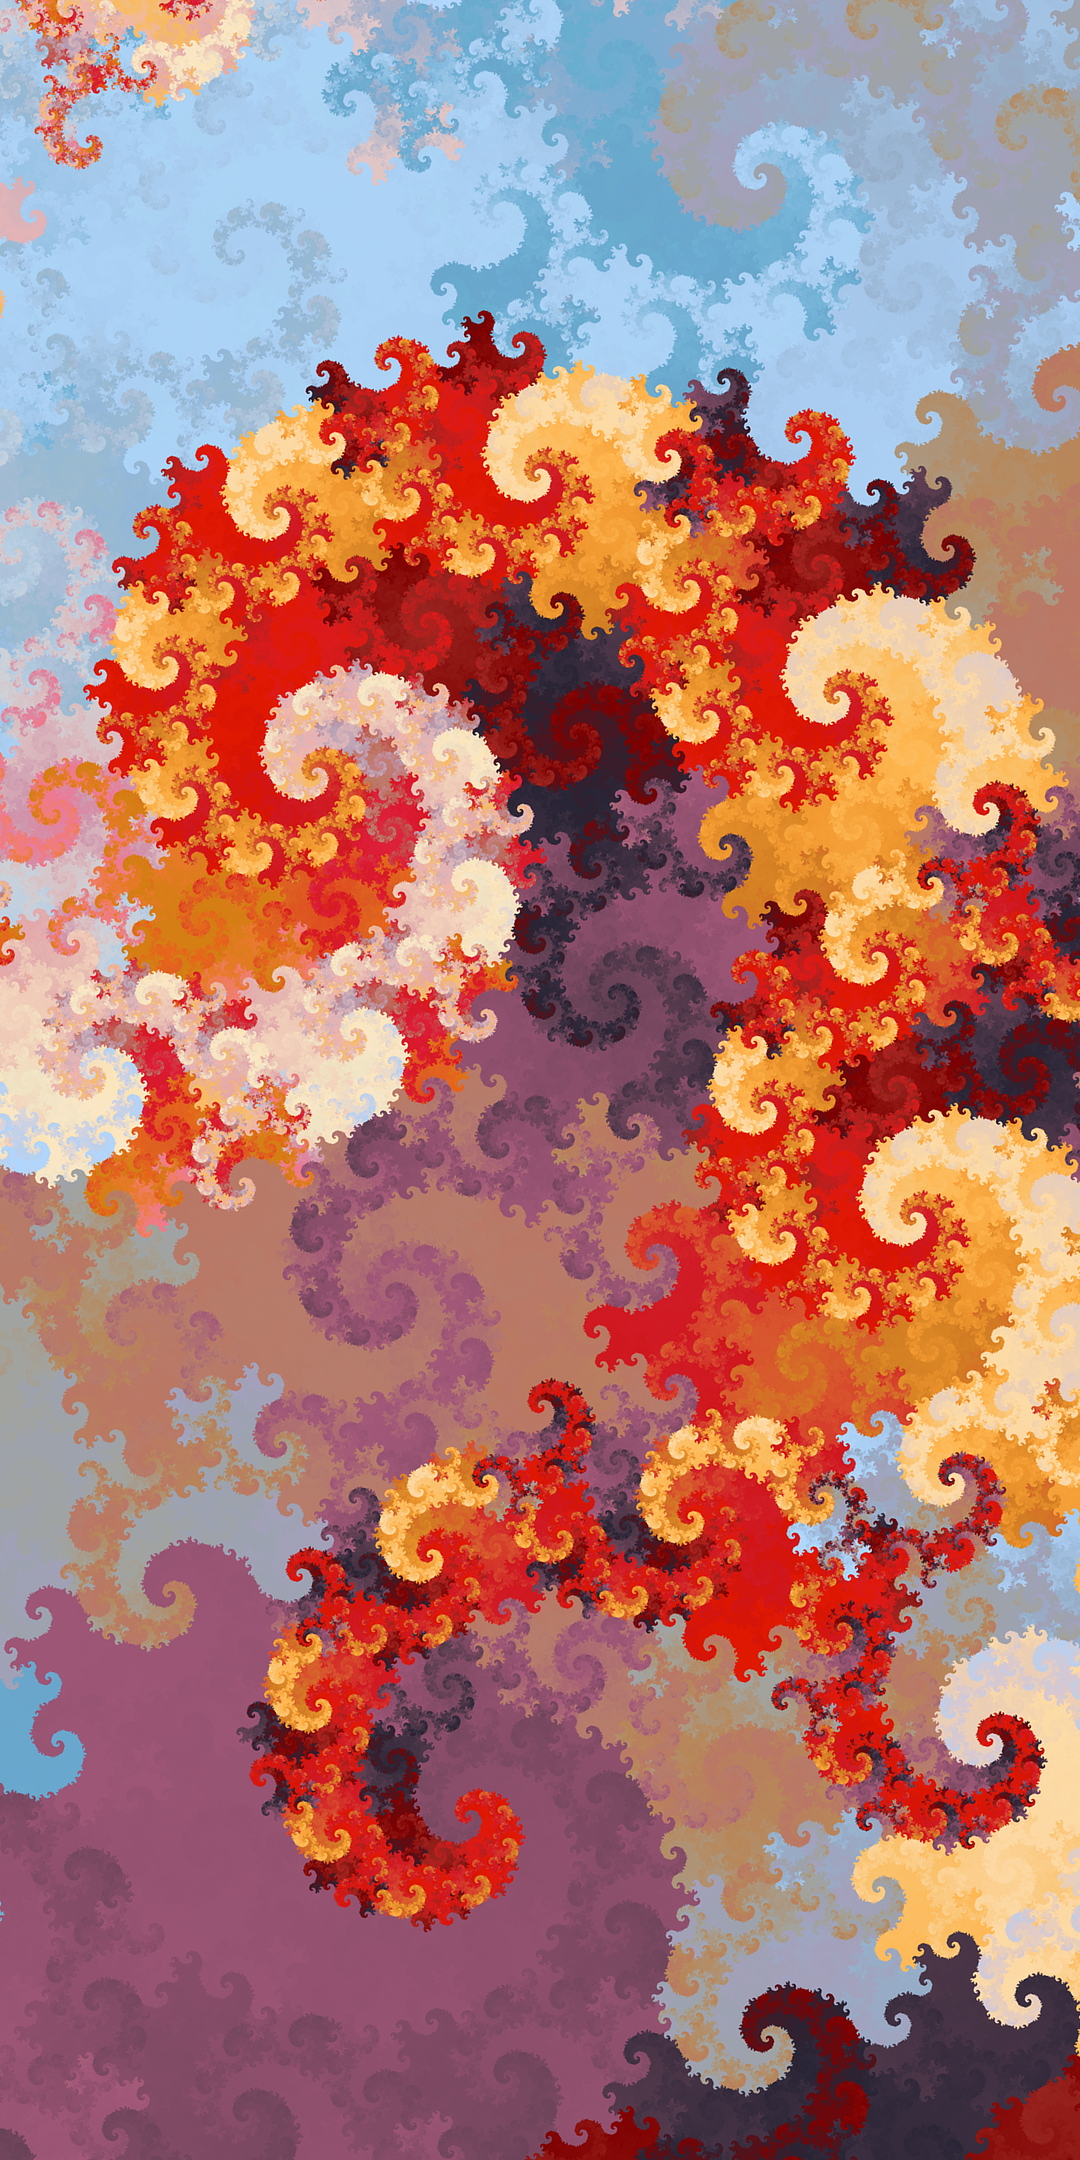 Wallpaper 731810